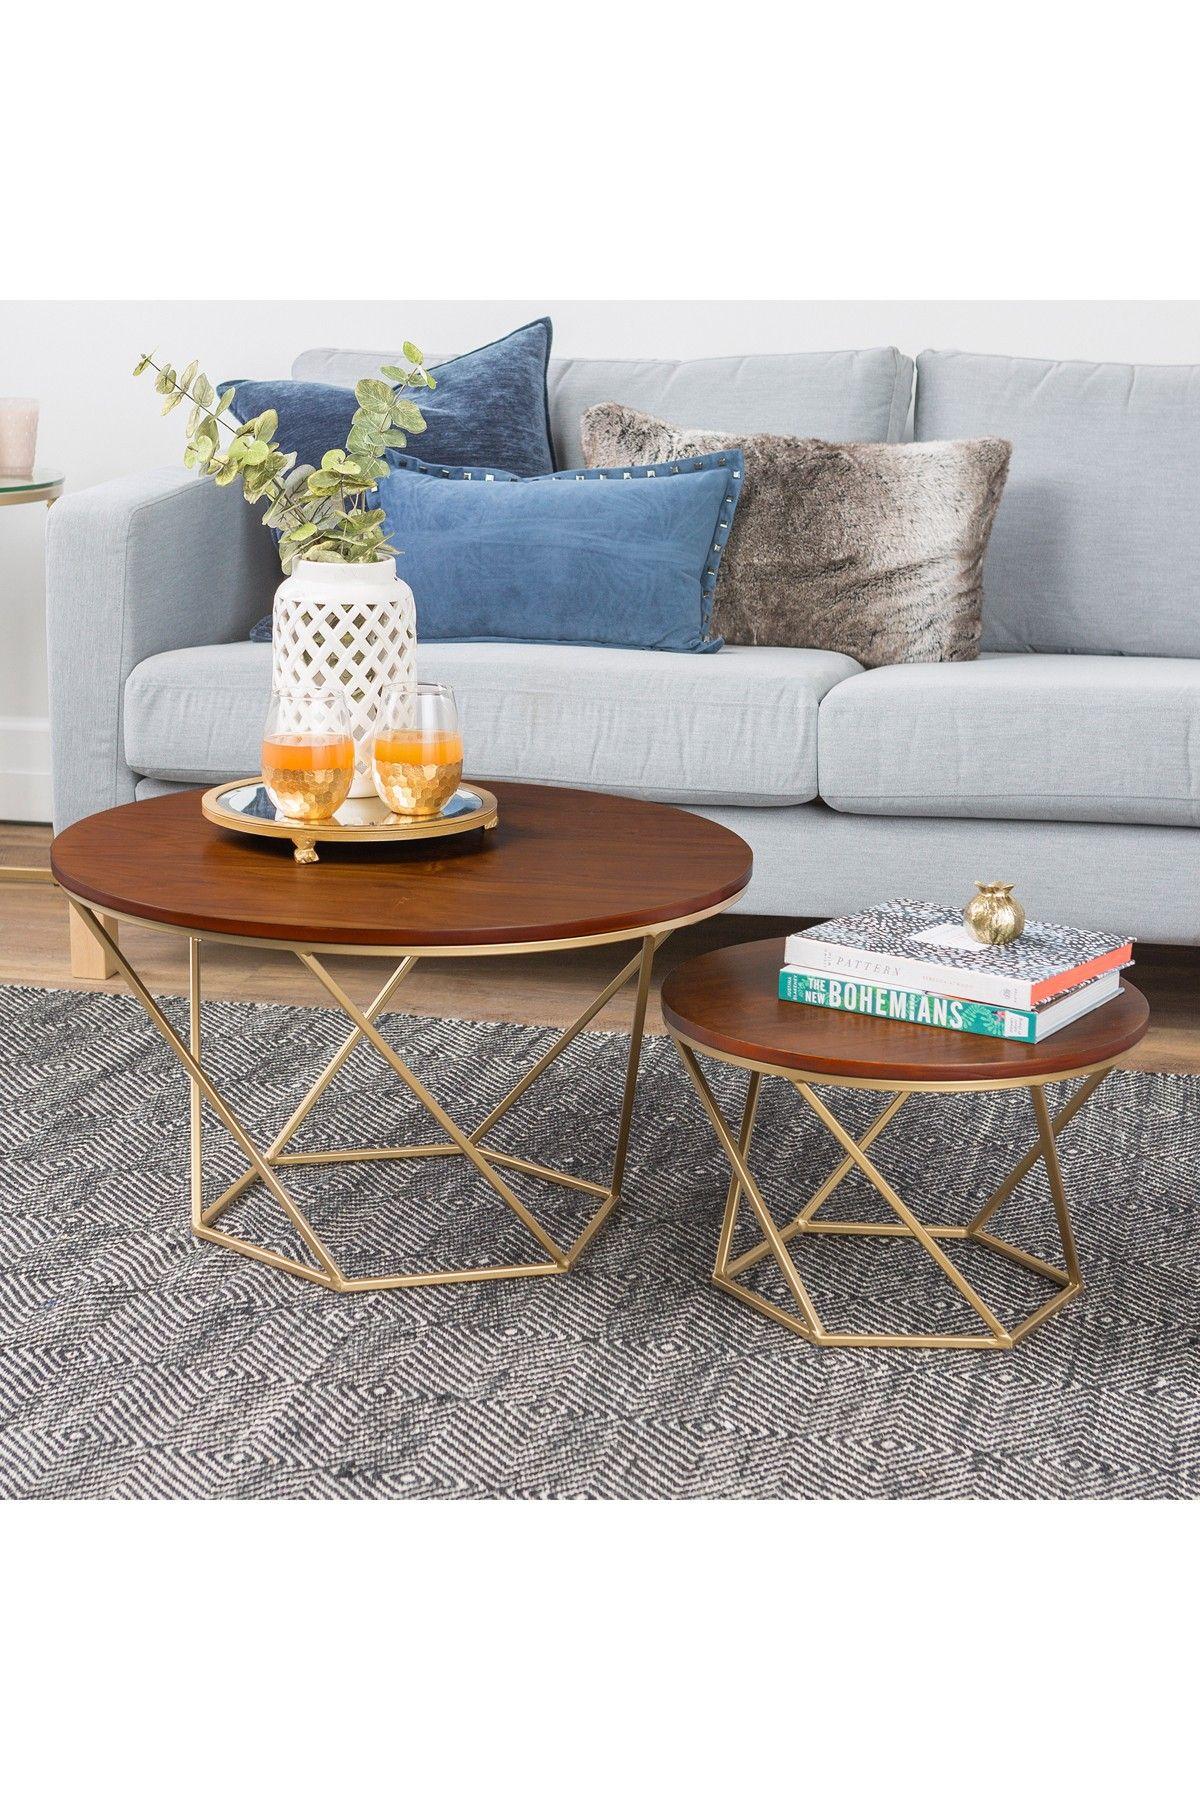 Walker Edison Furniture Company Walnut Gold Geometric Wood Nesting Coffee Tables Set Of 2 Nesting Coffee Tables Coffee Table Walnut Coffee Table [ 1800 x 1200 Pixel ]